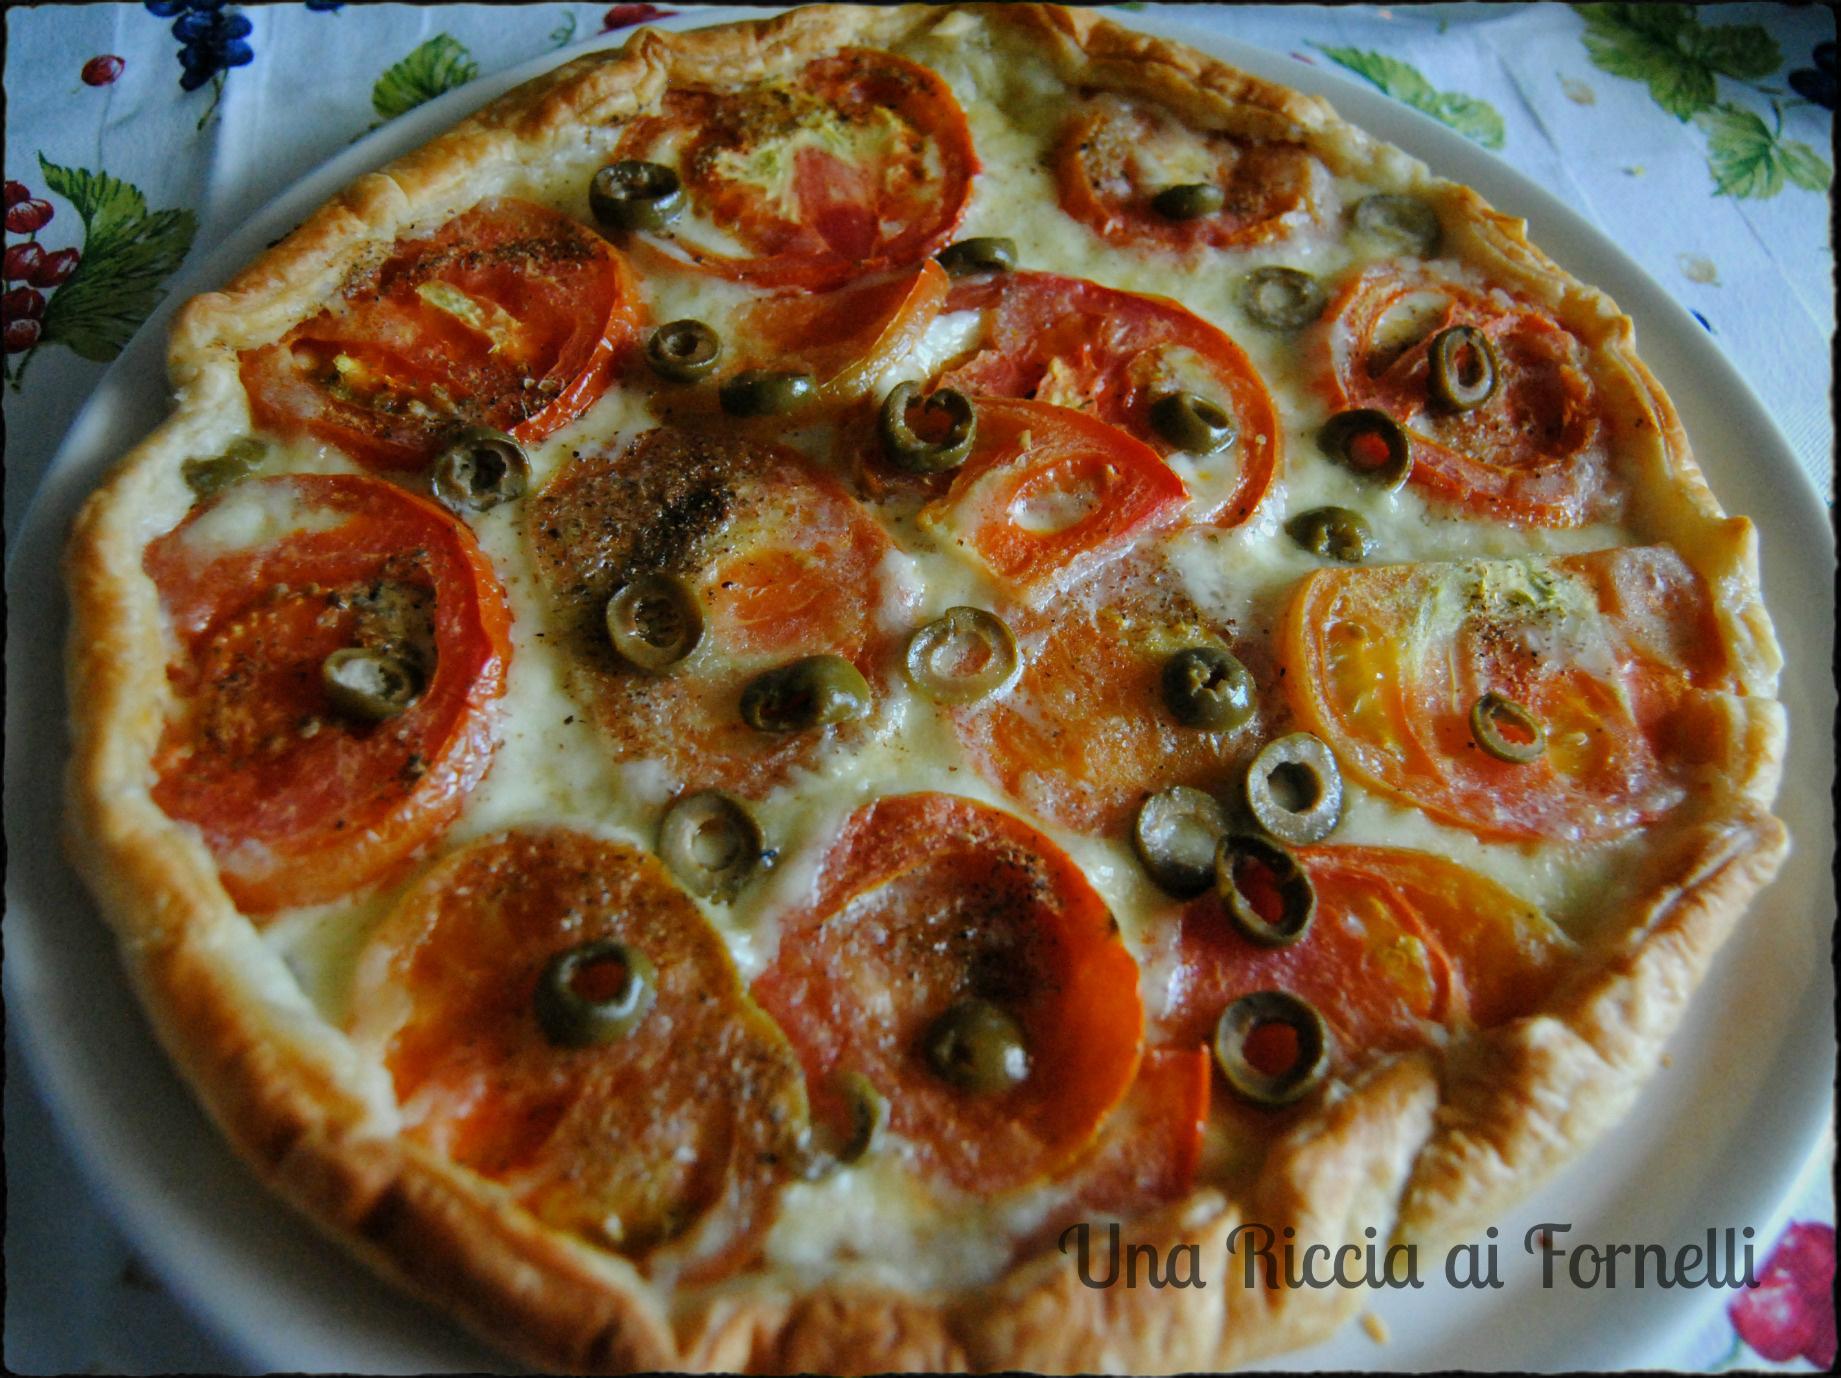 Torta rustica mediterranea ricetta microonde una riccia for Microonde ricette